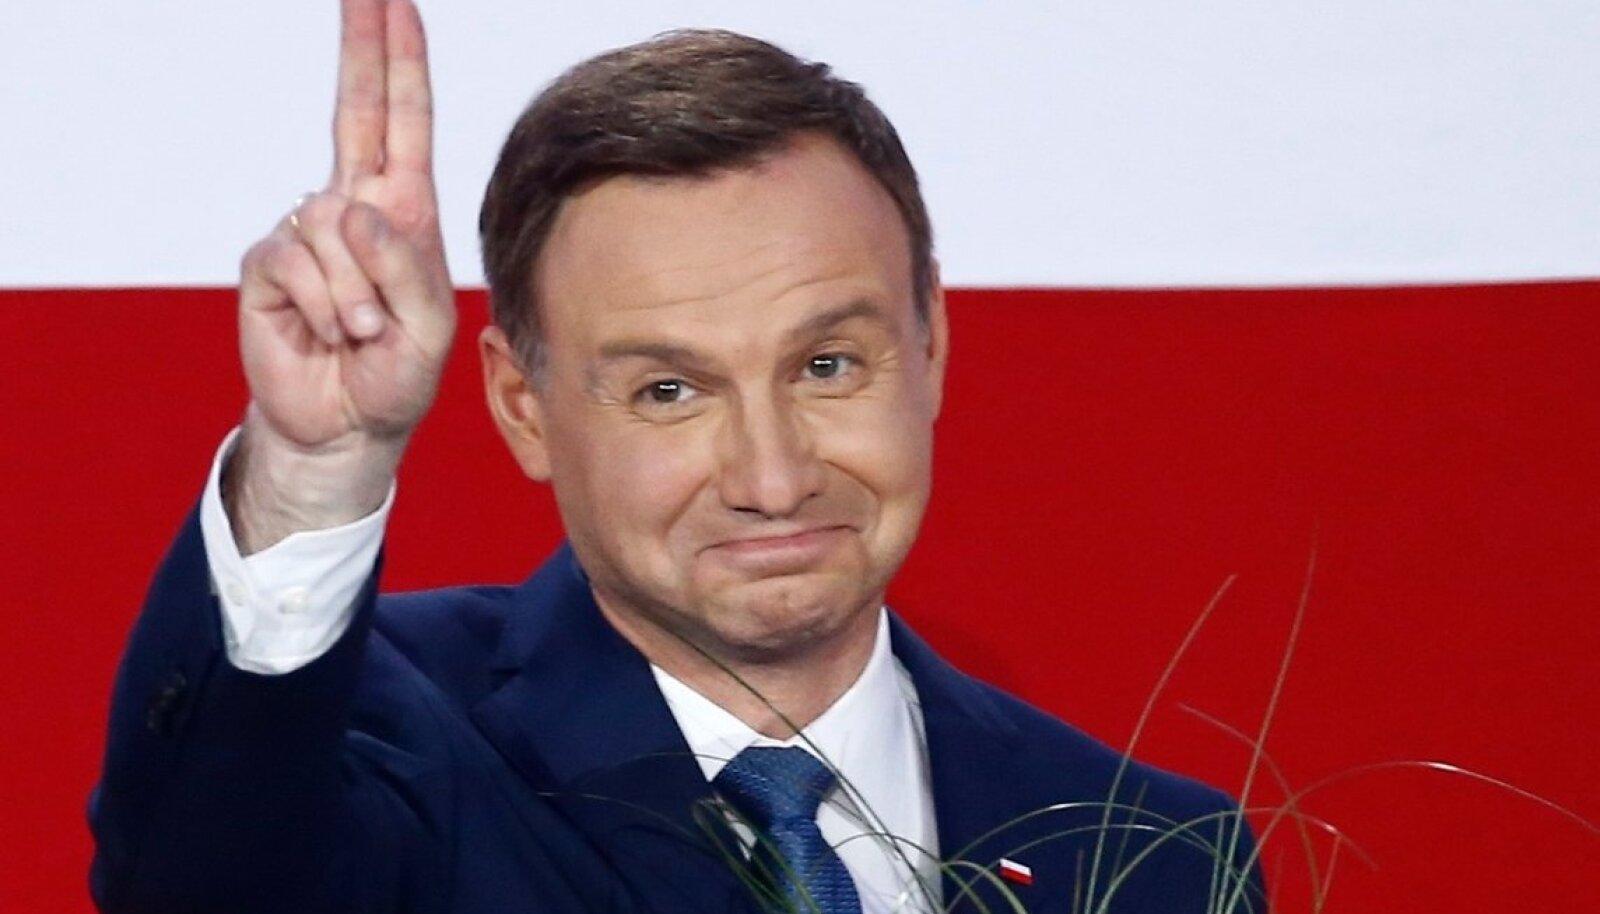 Poola president Andrzej Duda